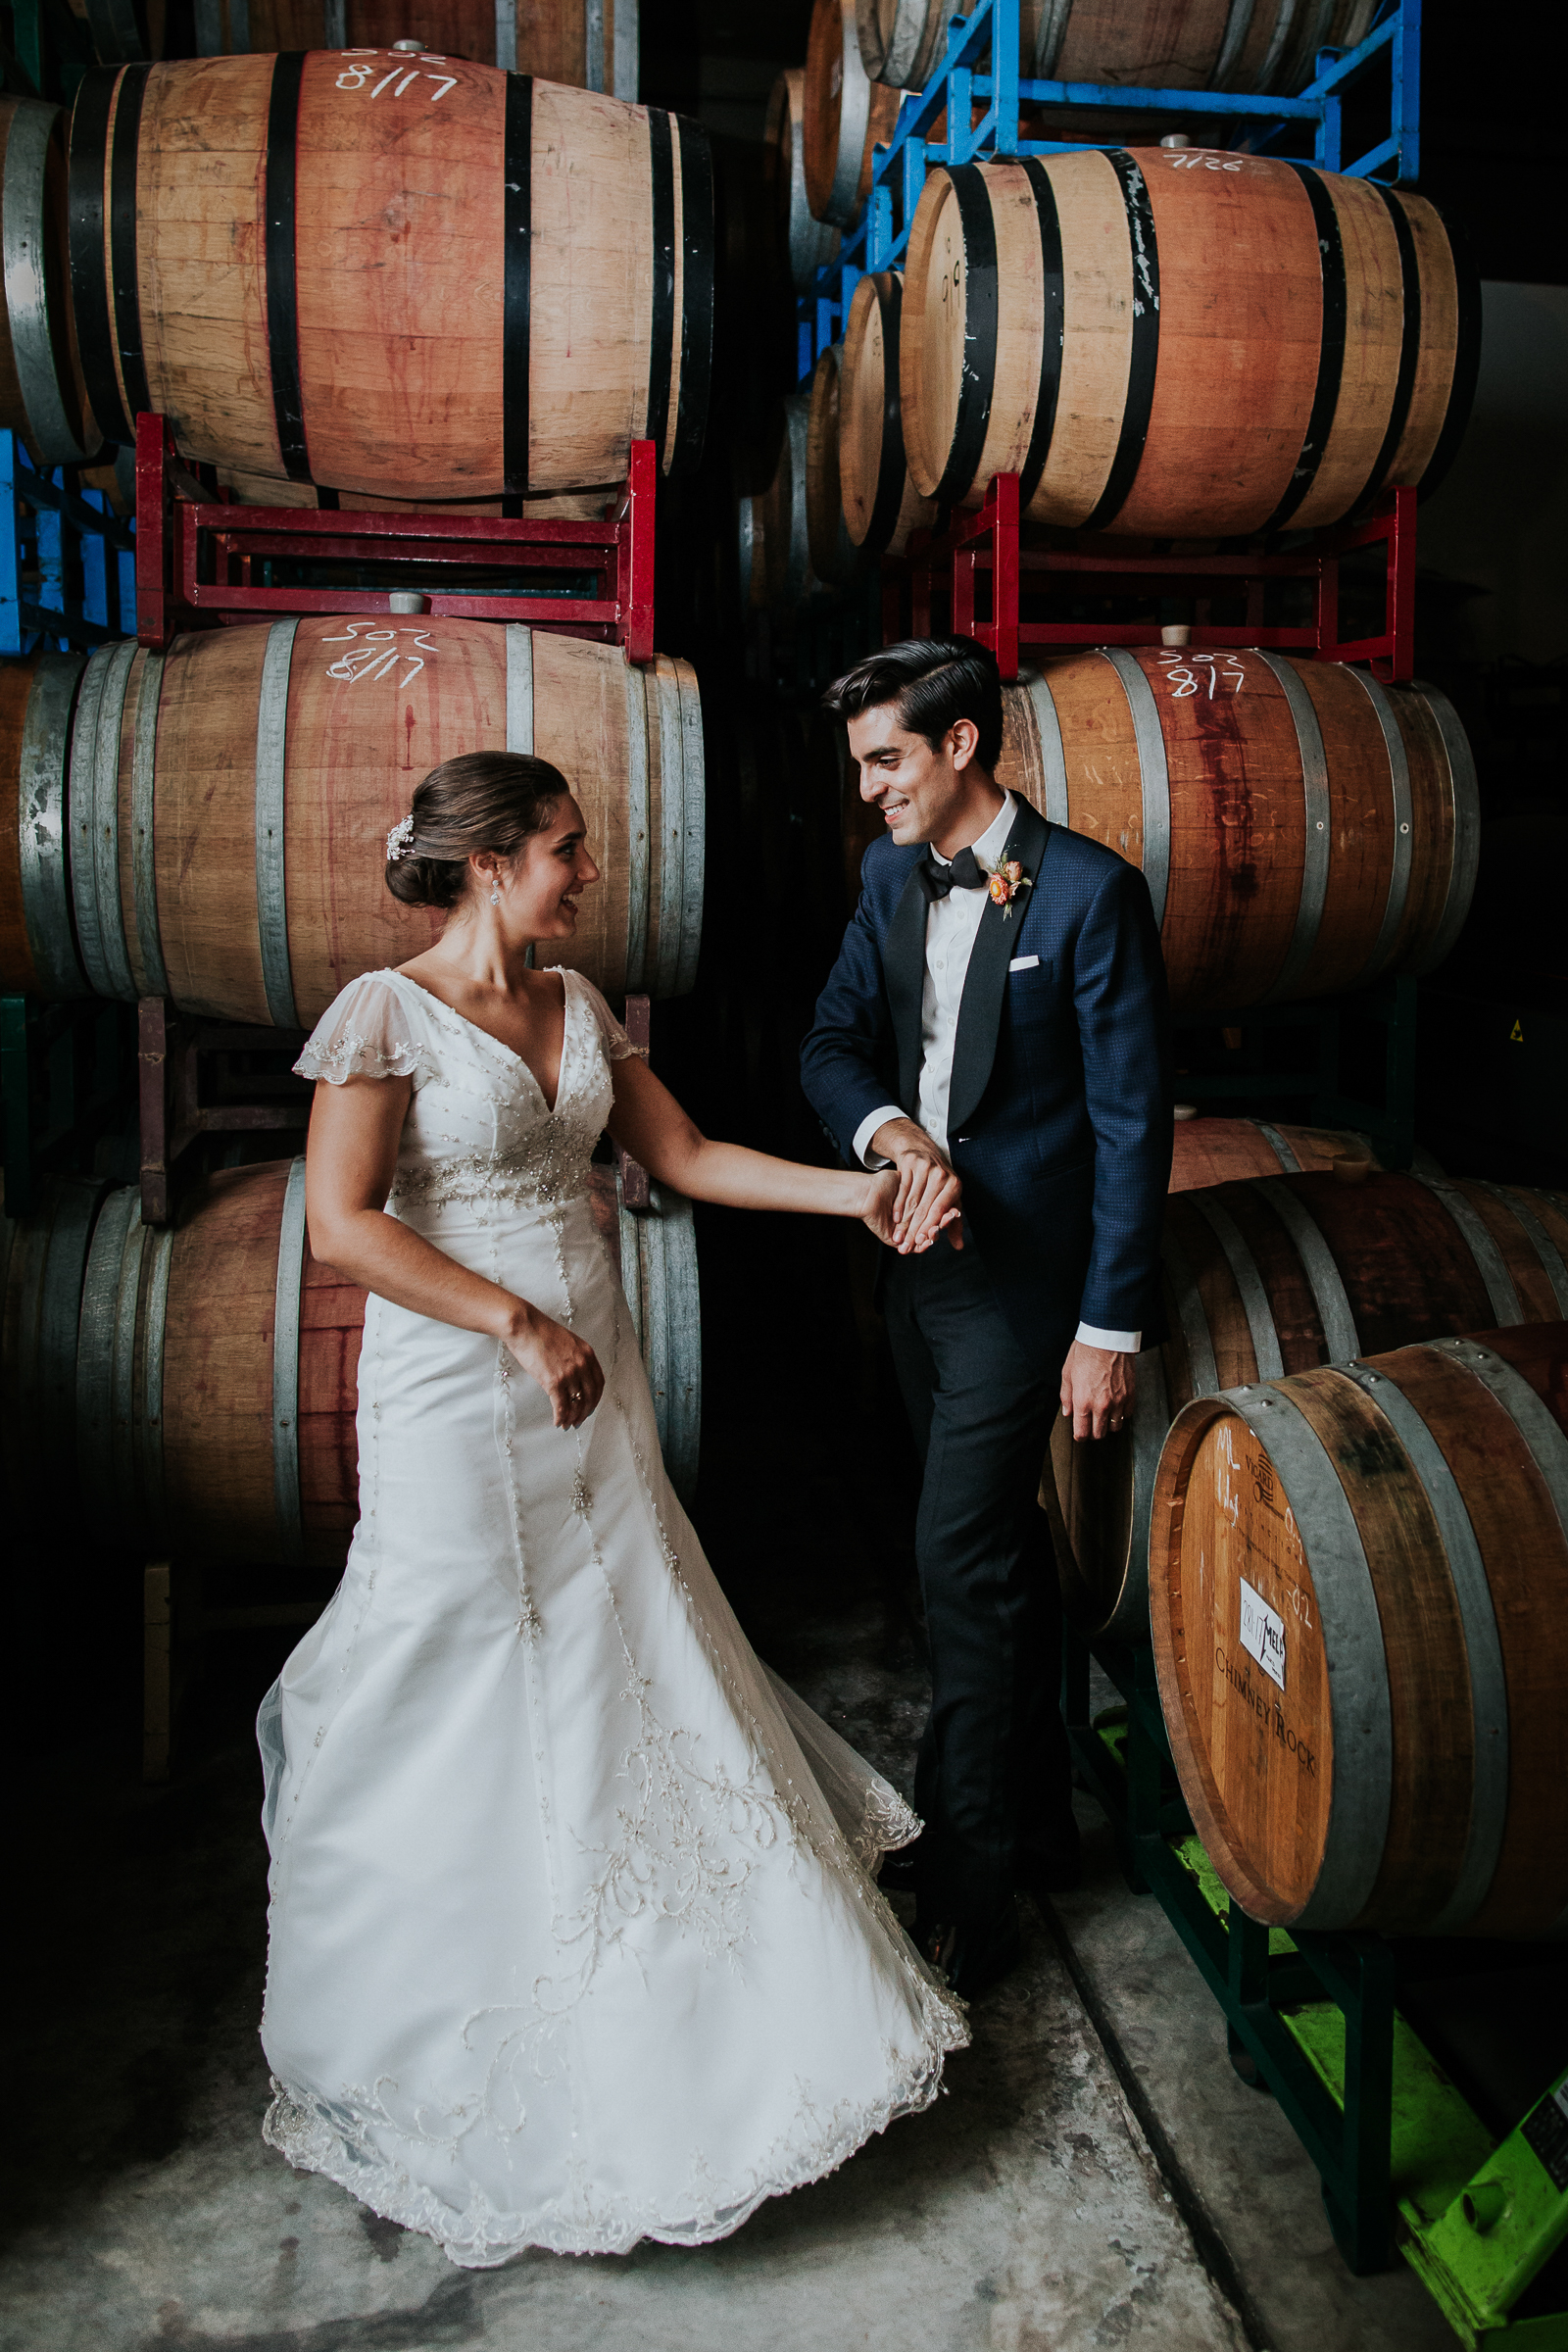 Brooklyn-Winery-NYC-Editorial-Documentary-Wedding-Photographer-Gina-Oli-114.jpg